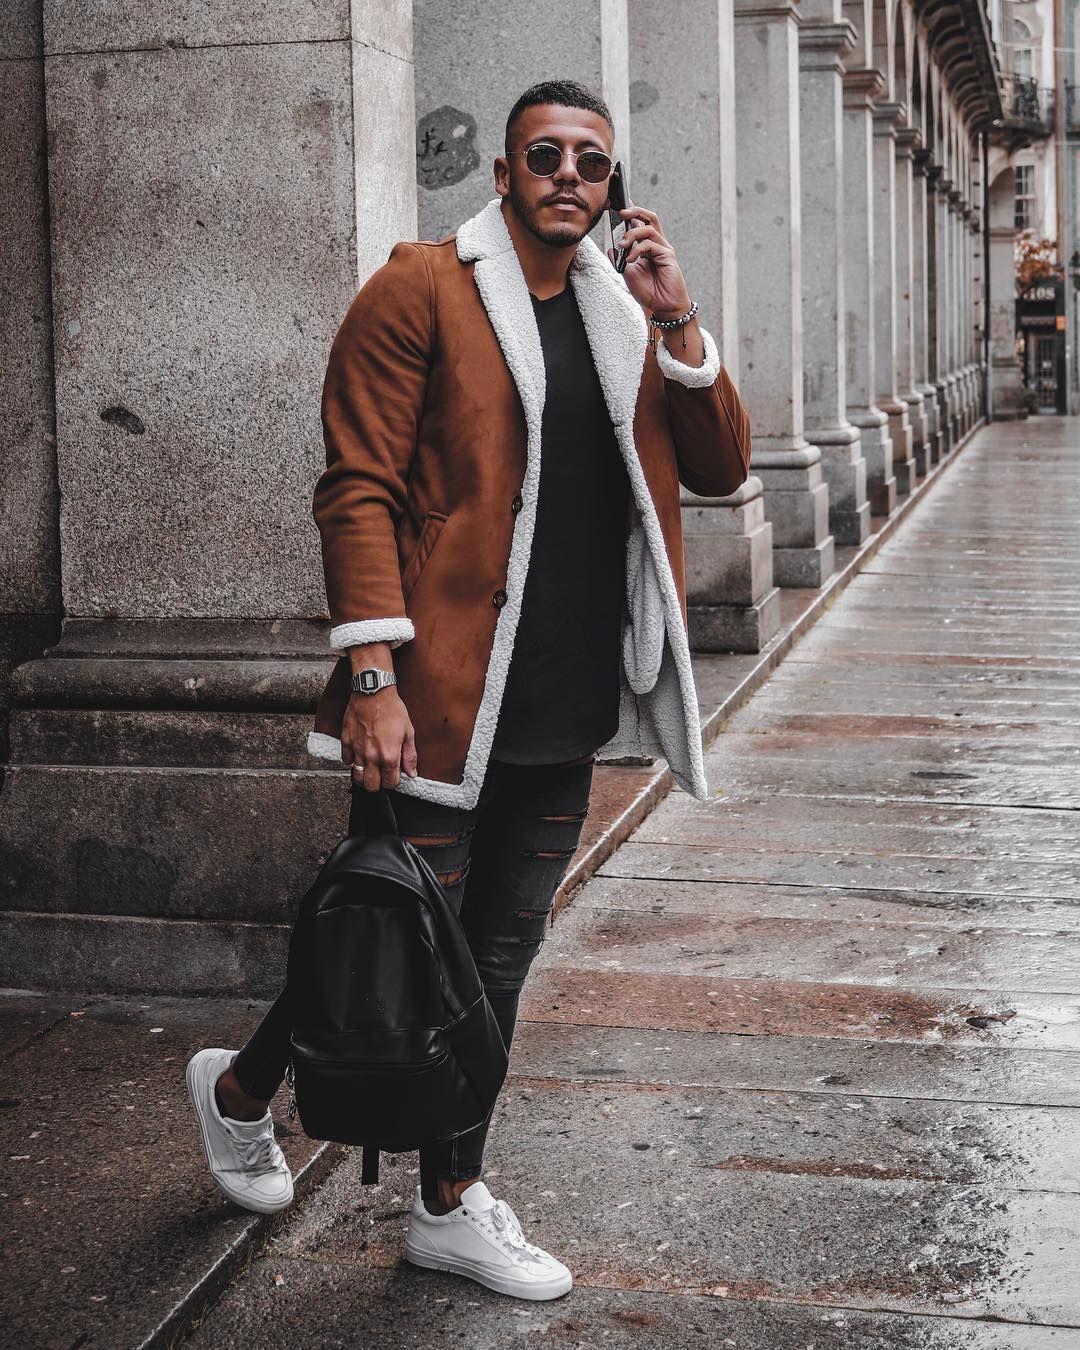 Sergiofernandespreto Vintage Streetwear Mode Homme Chemise Classe Street Supreme Collection Streetwear Disponible Streetwear Mode Vintage Mode